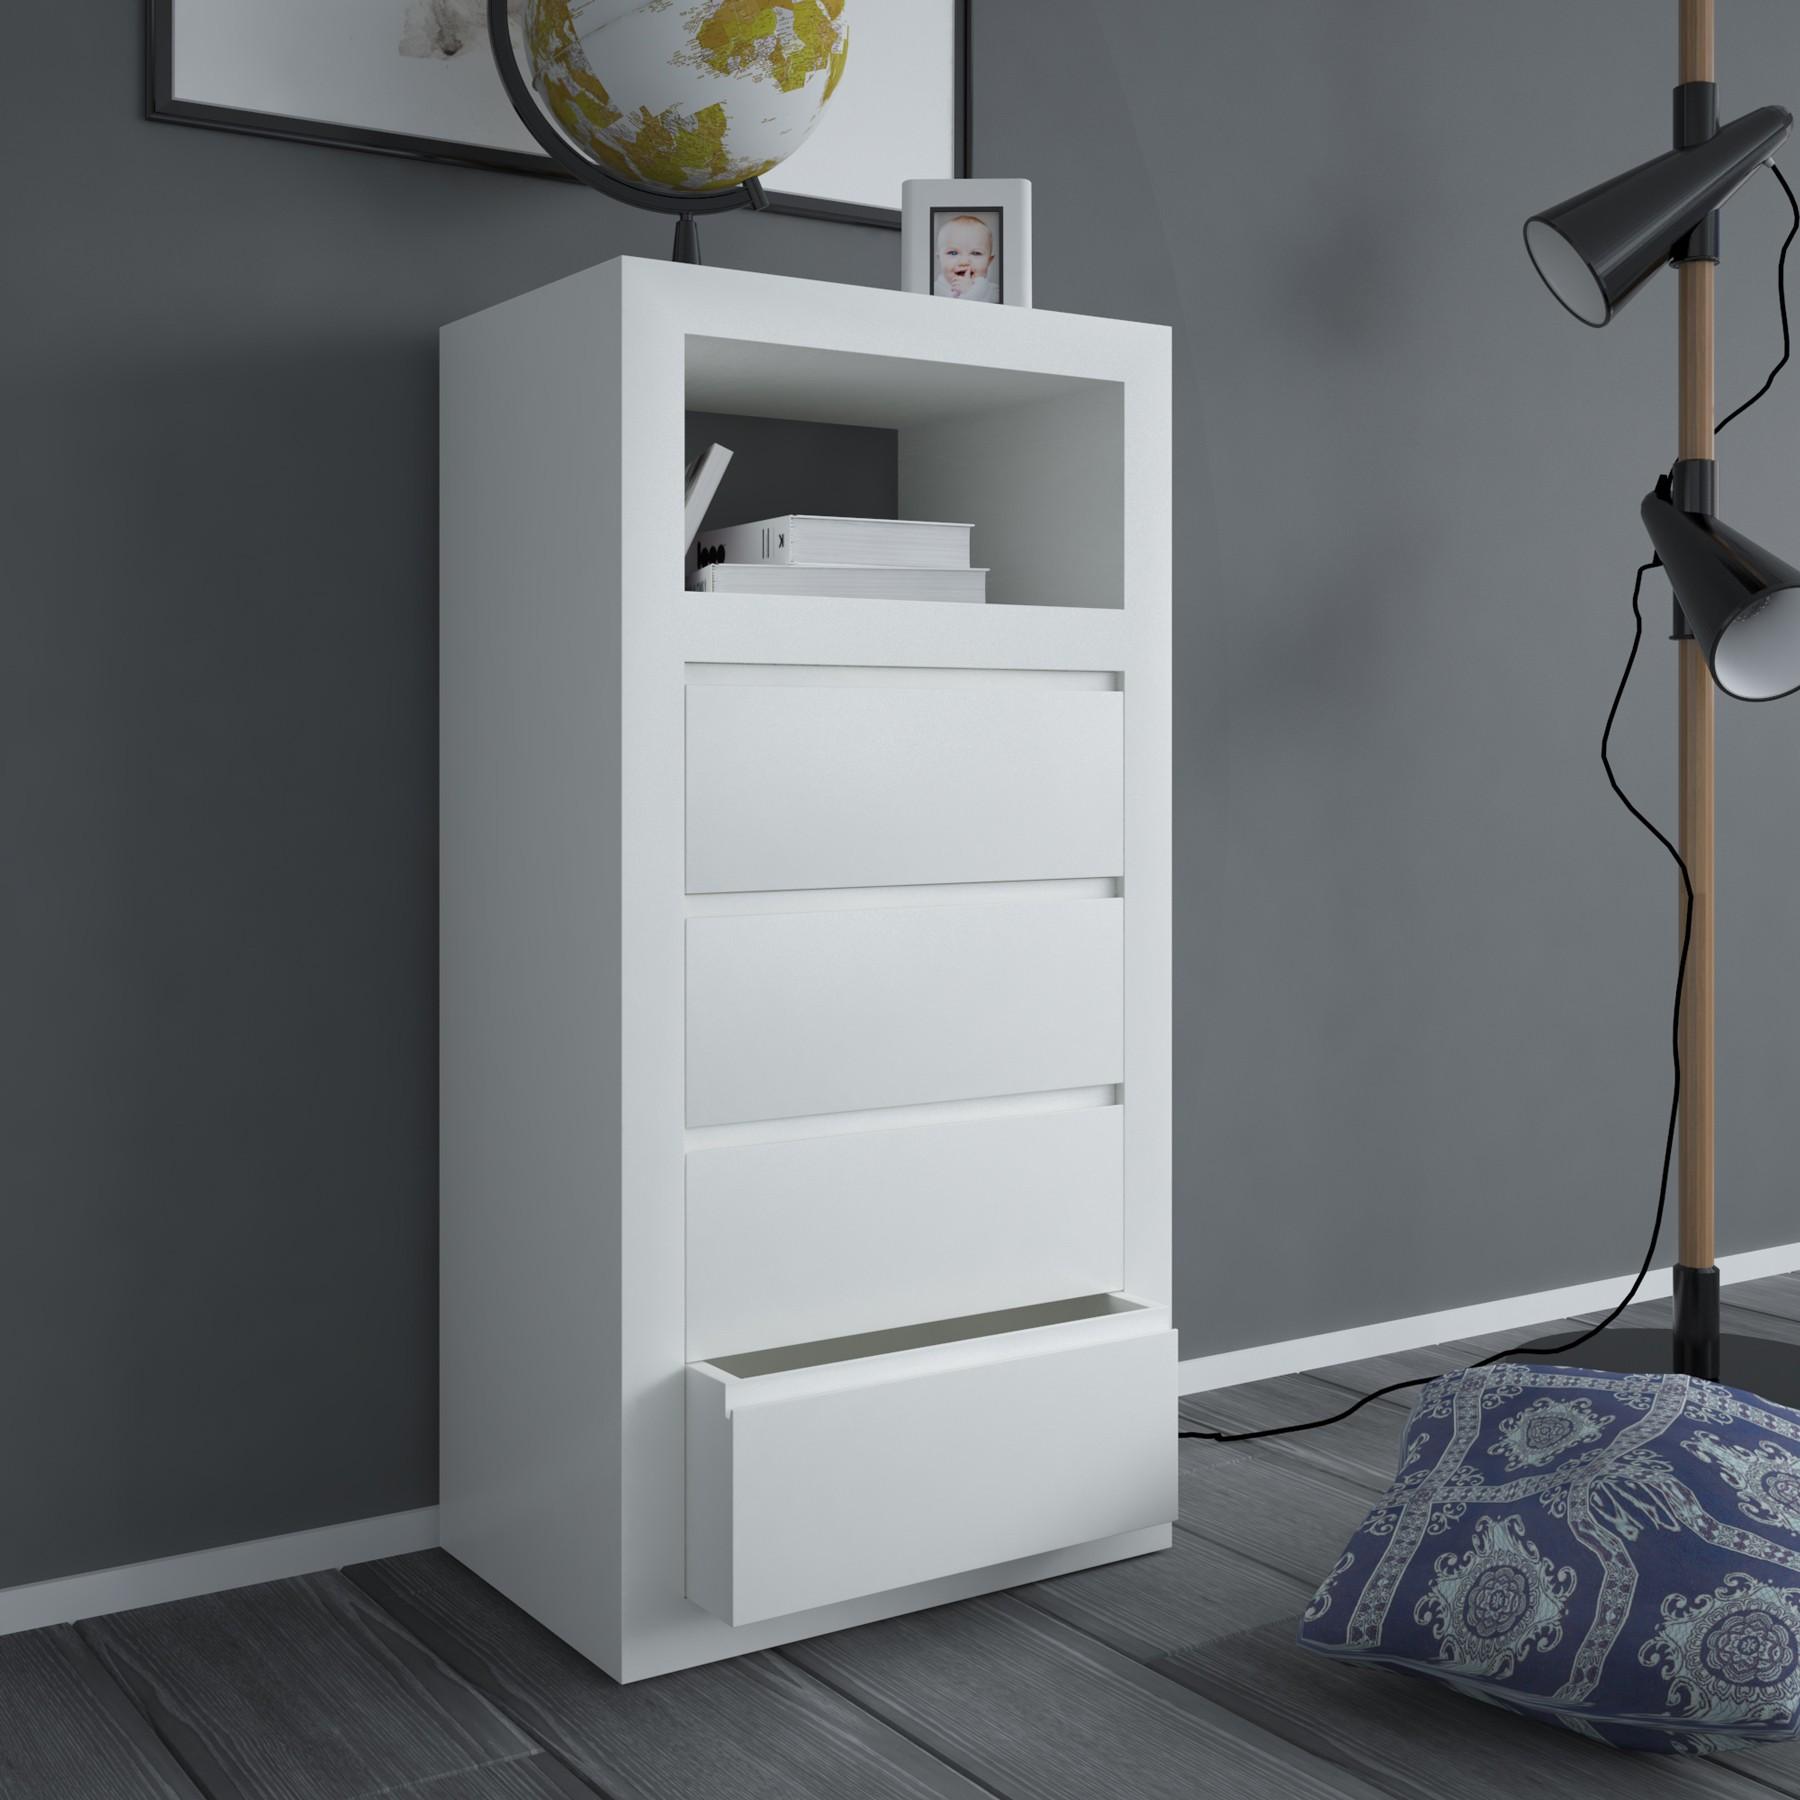 Sinfonier minimalista lacado blanco modelo 8 for Comodas modernas para dormitorio